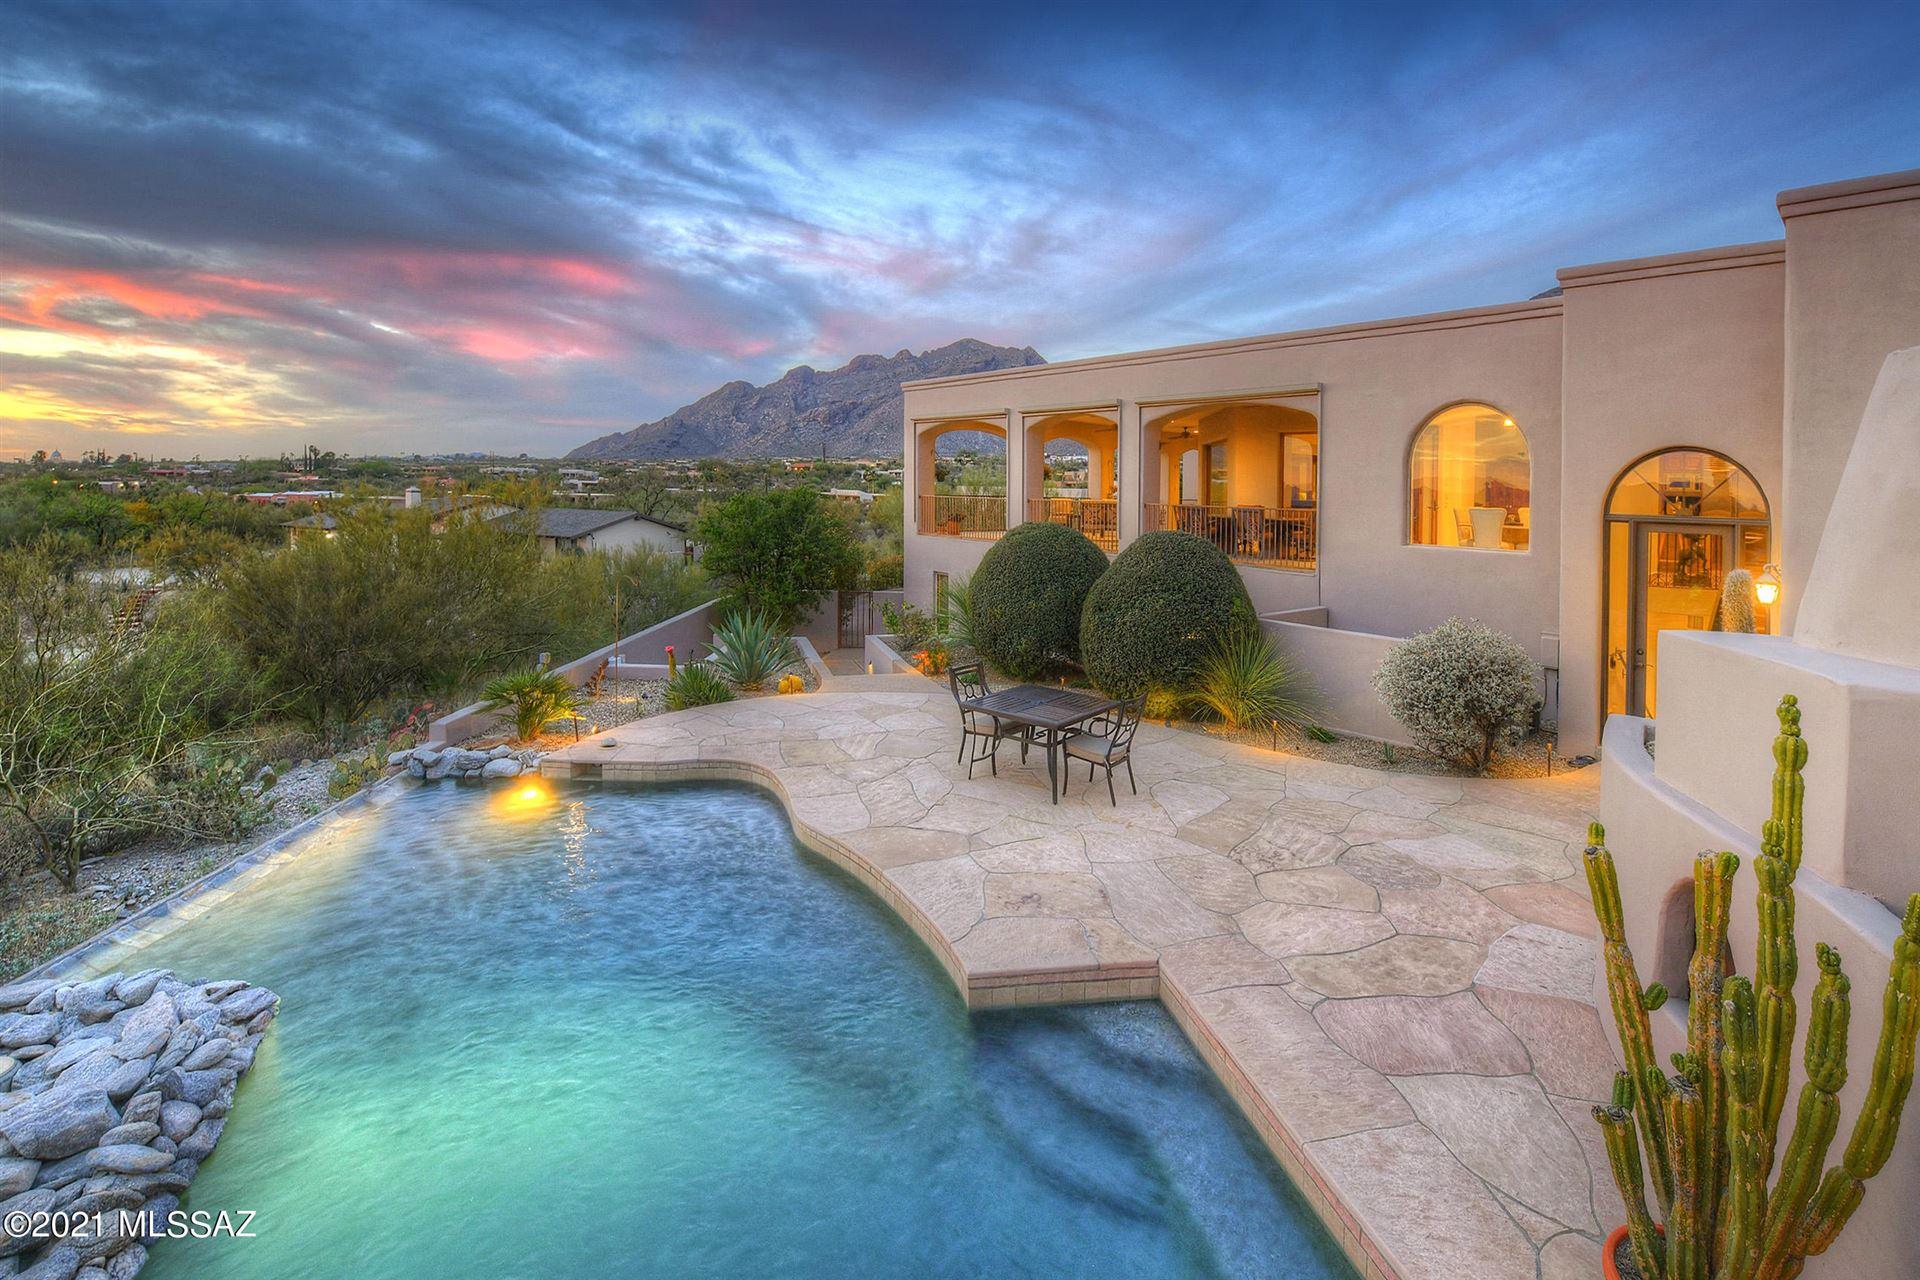 6761 N PLACITA MANZANITA, Tucson, AZ 85718 - MLS#: 22109146